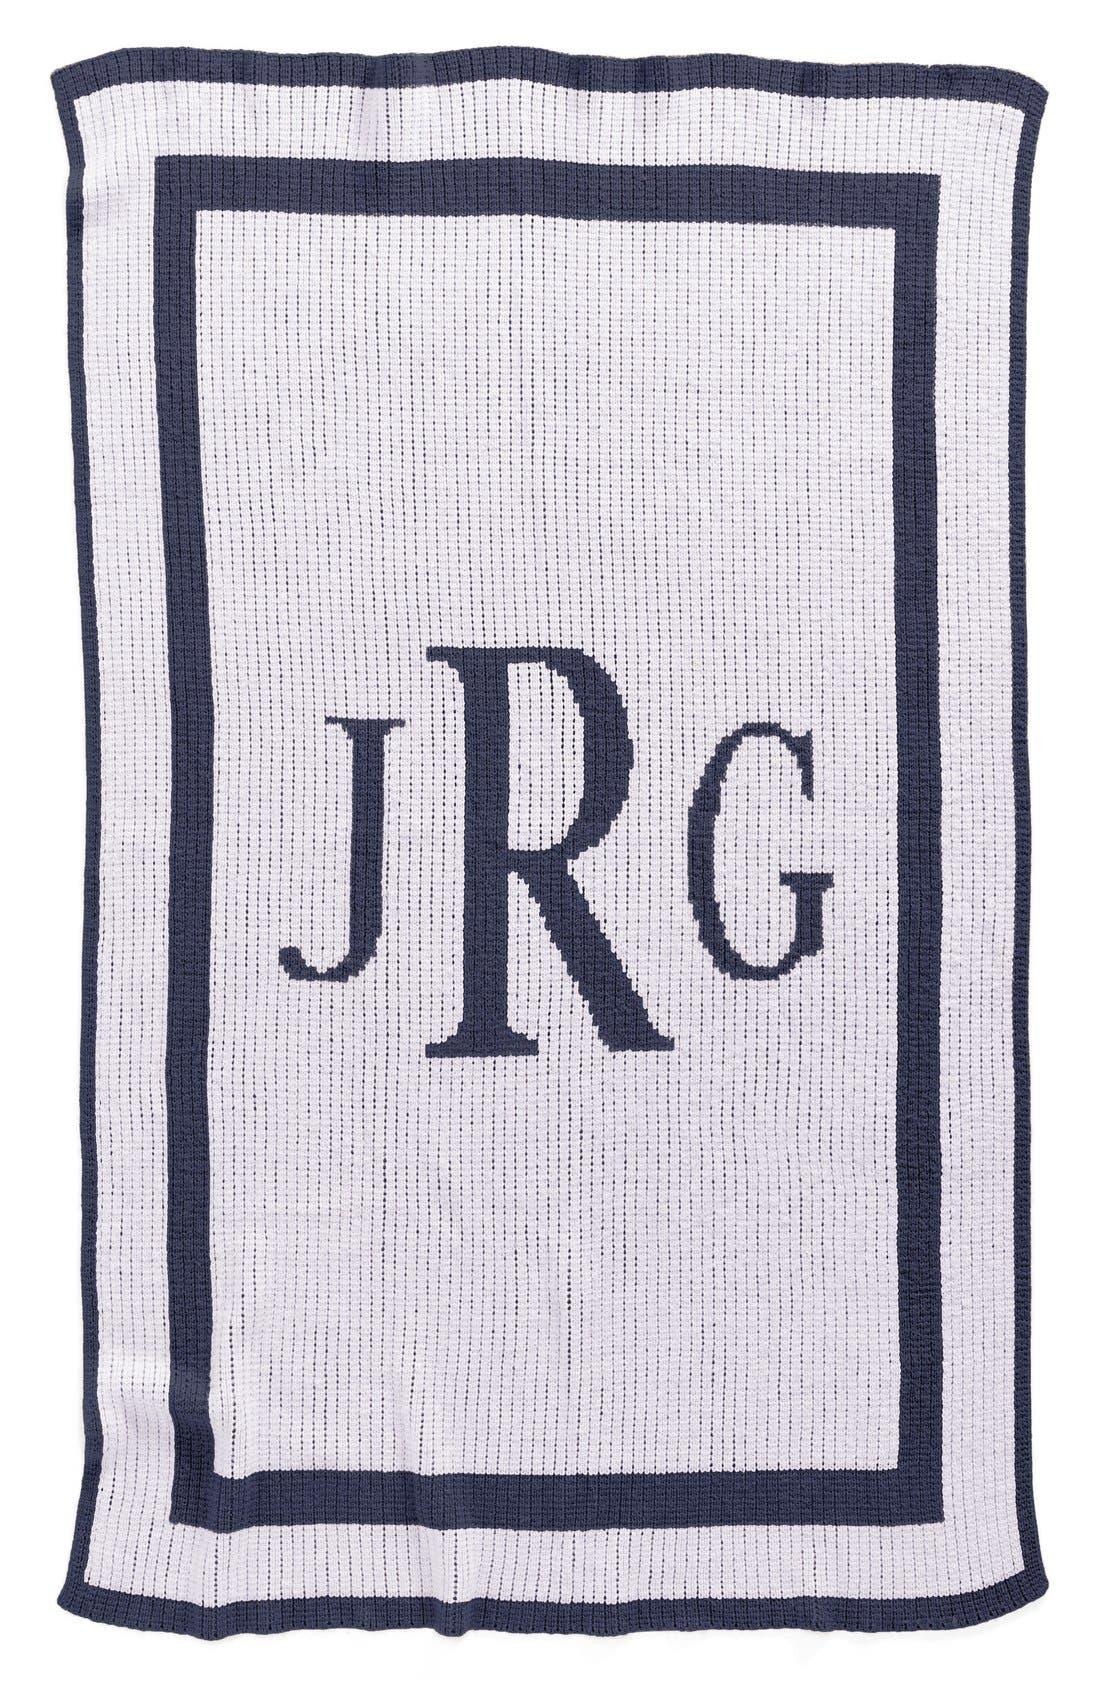 'Classic Monogram' Personalized Crib Blanket,                         Main,                         color, NAVY/ WHITE